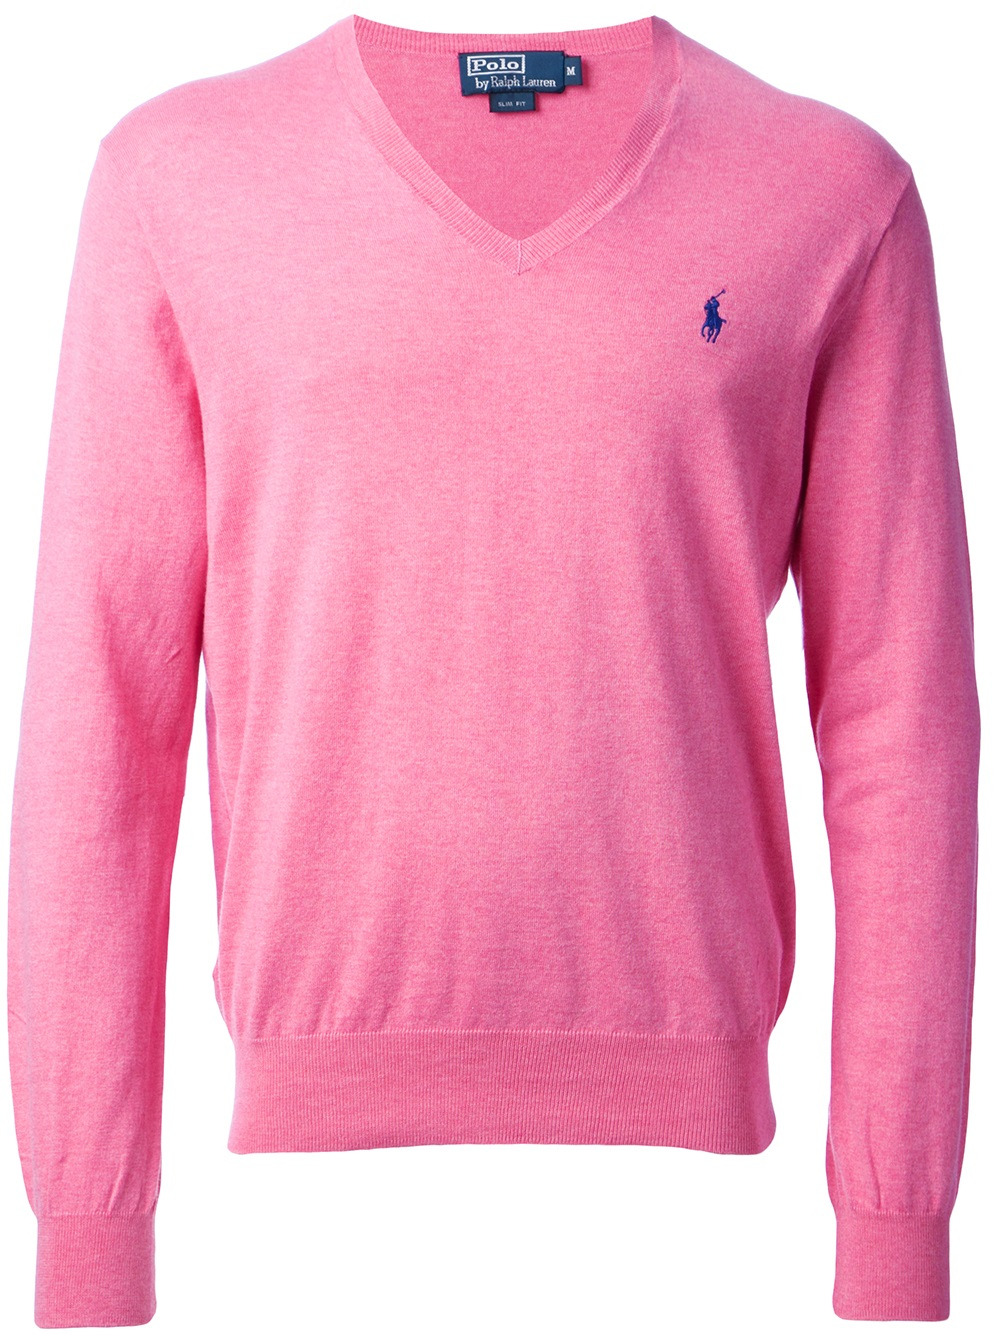 Polo ralph lauren Classic Sweater in Purple for Men | Lyst